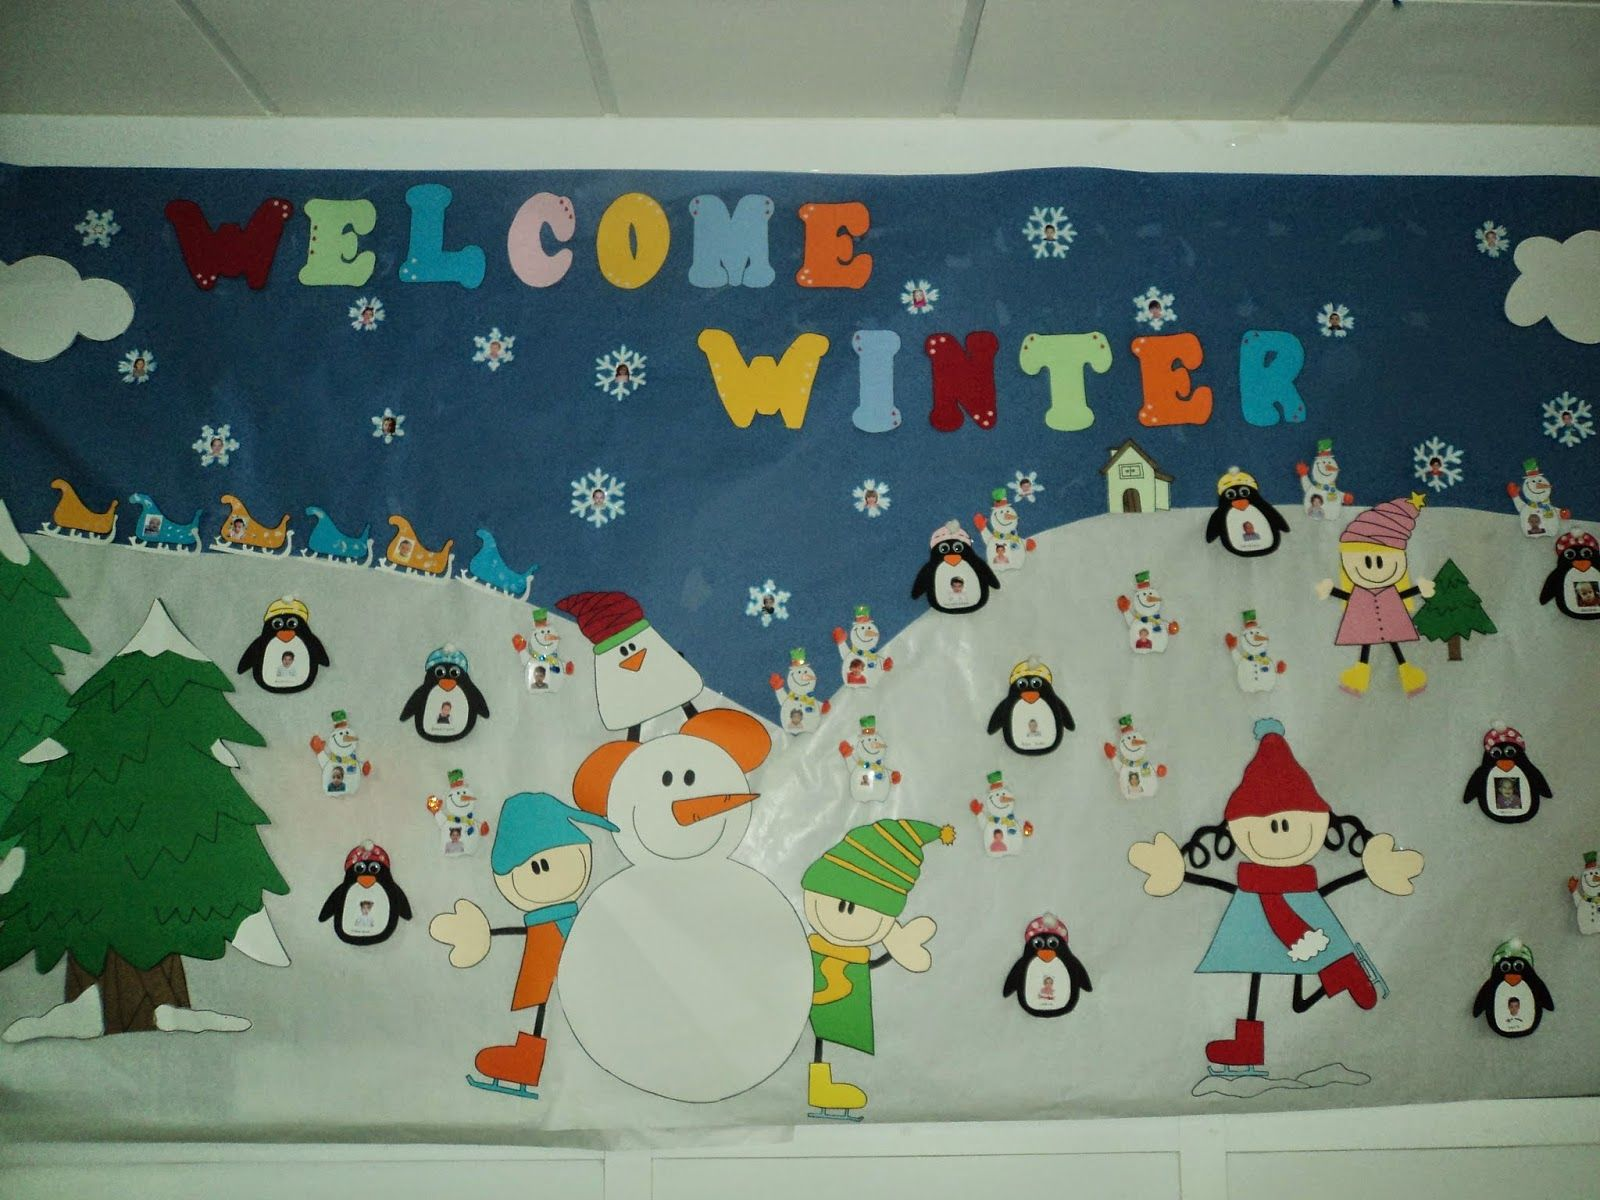 Centro de educaci n infantil almeragua mural de - Murales decorativos de navidad ...